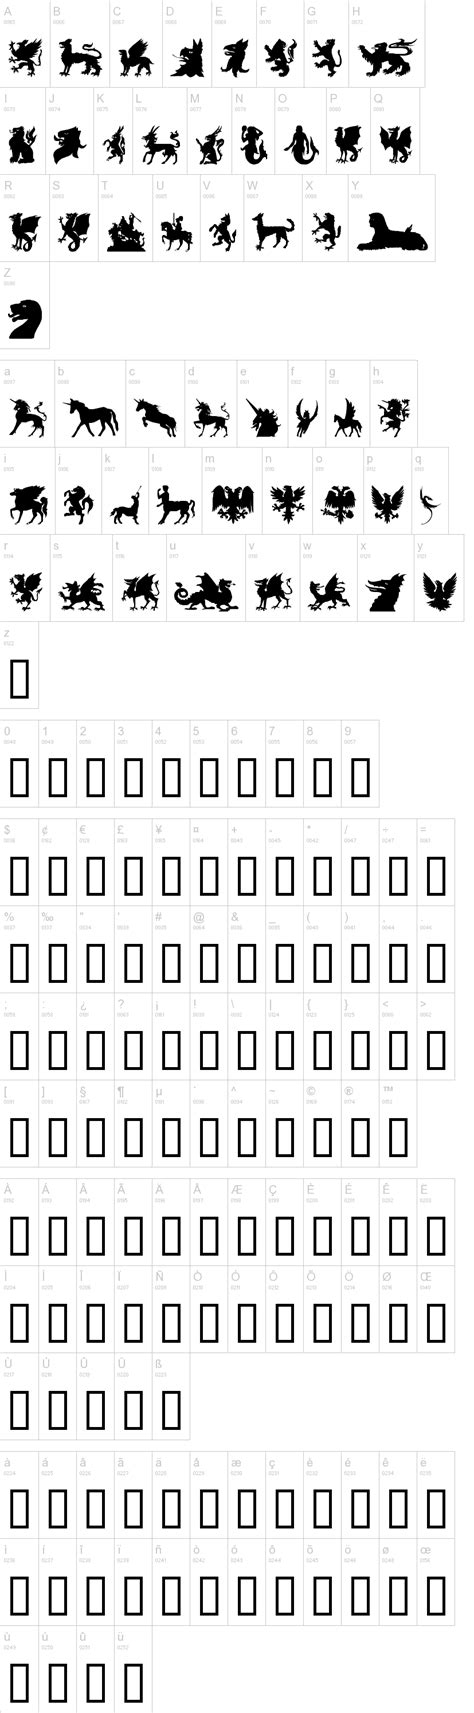 dafont zenzai itacha deerry download file font tips anime artikel